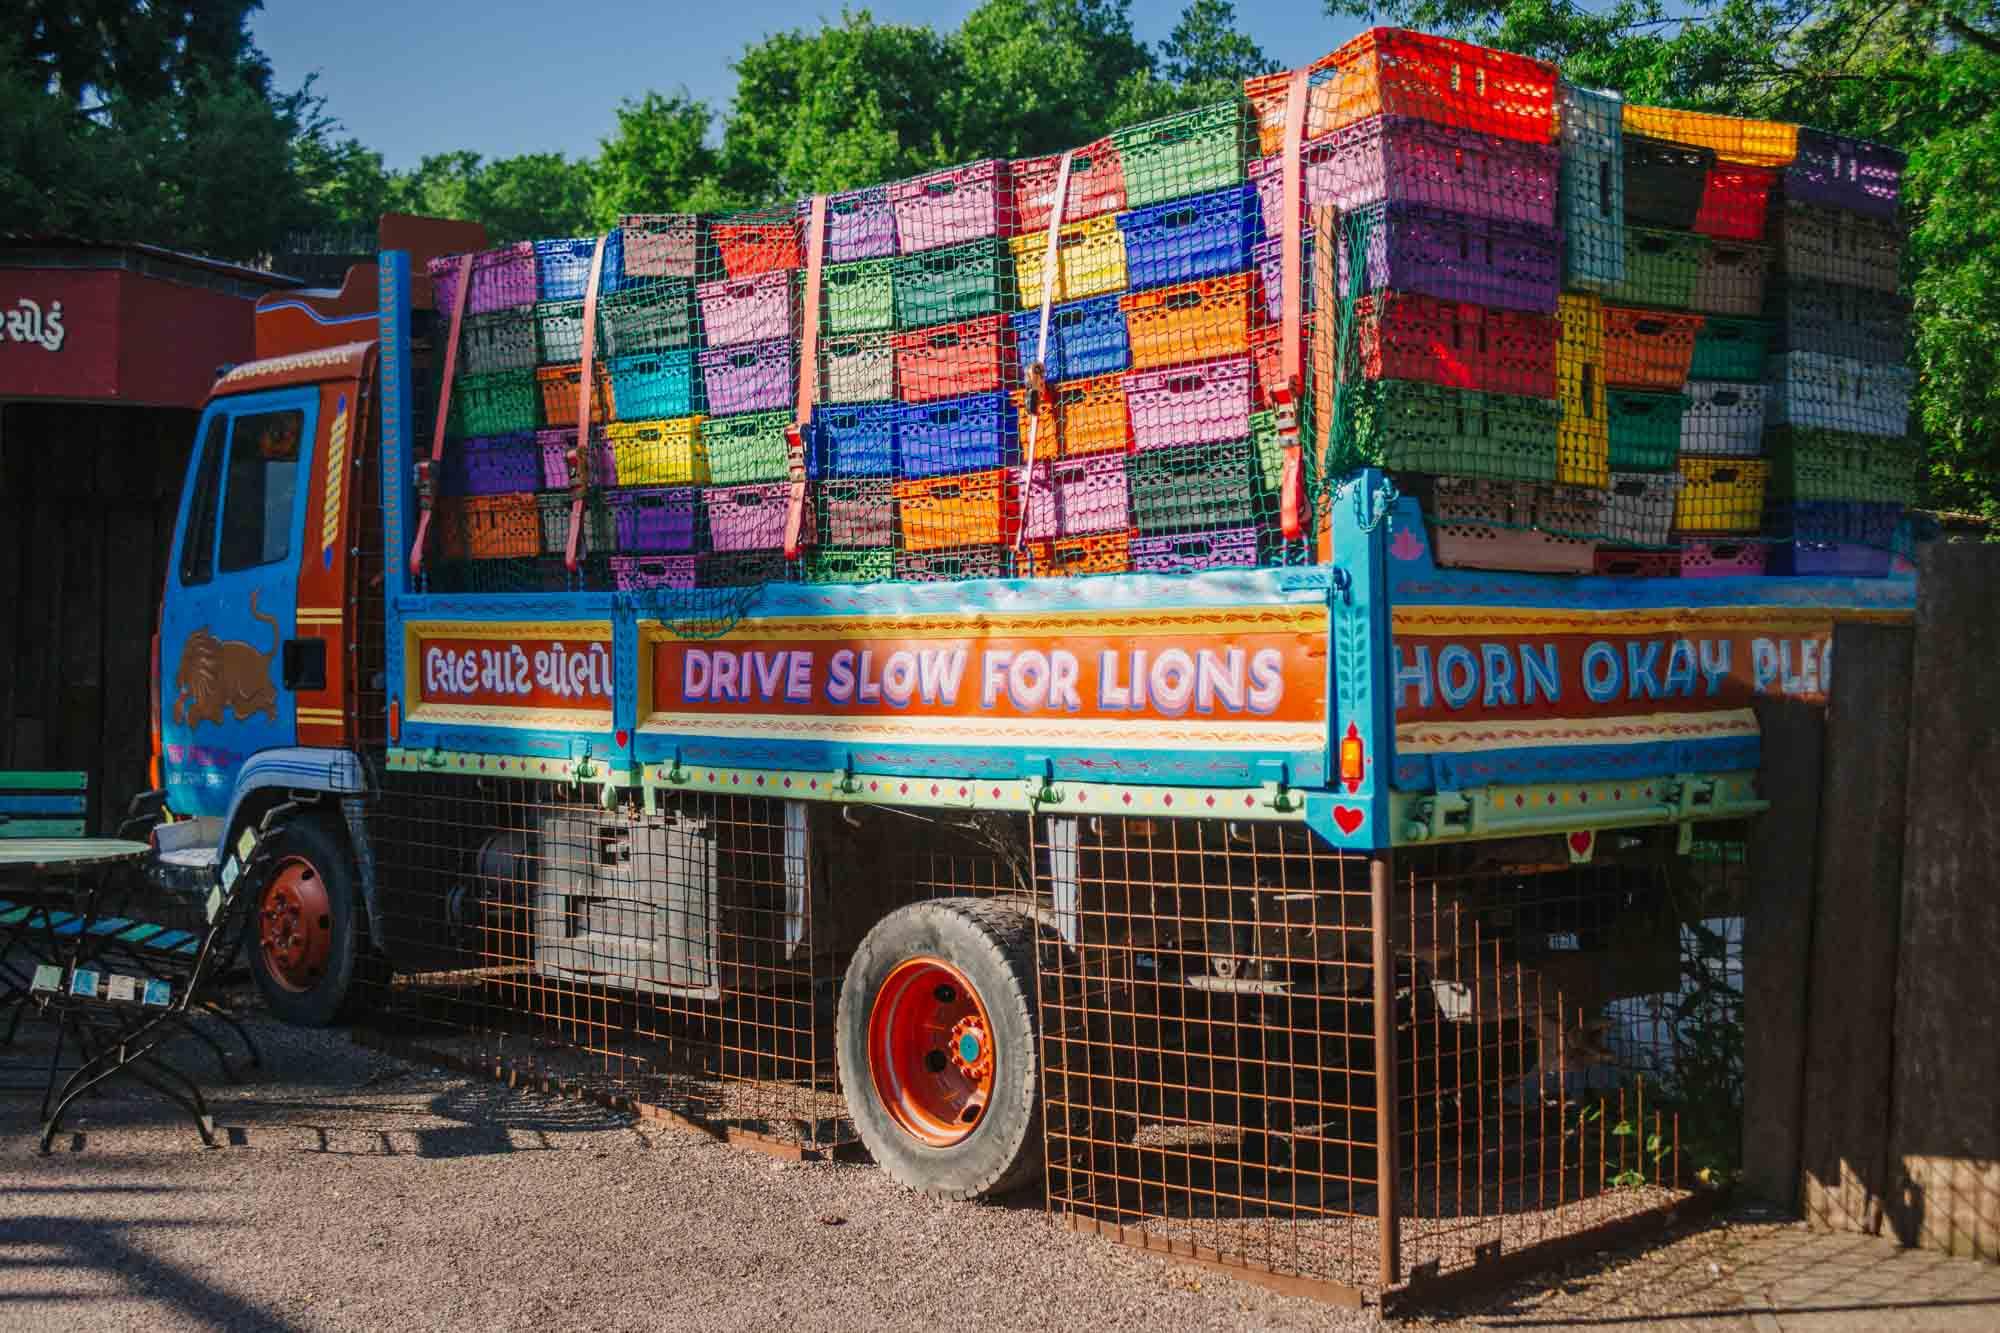 Gir Lion Lodge - London Zoo